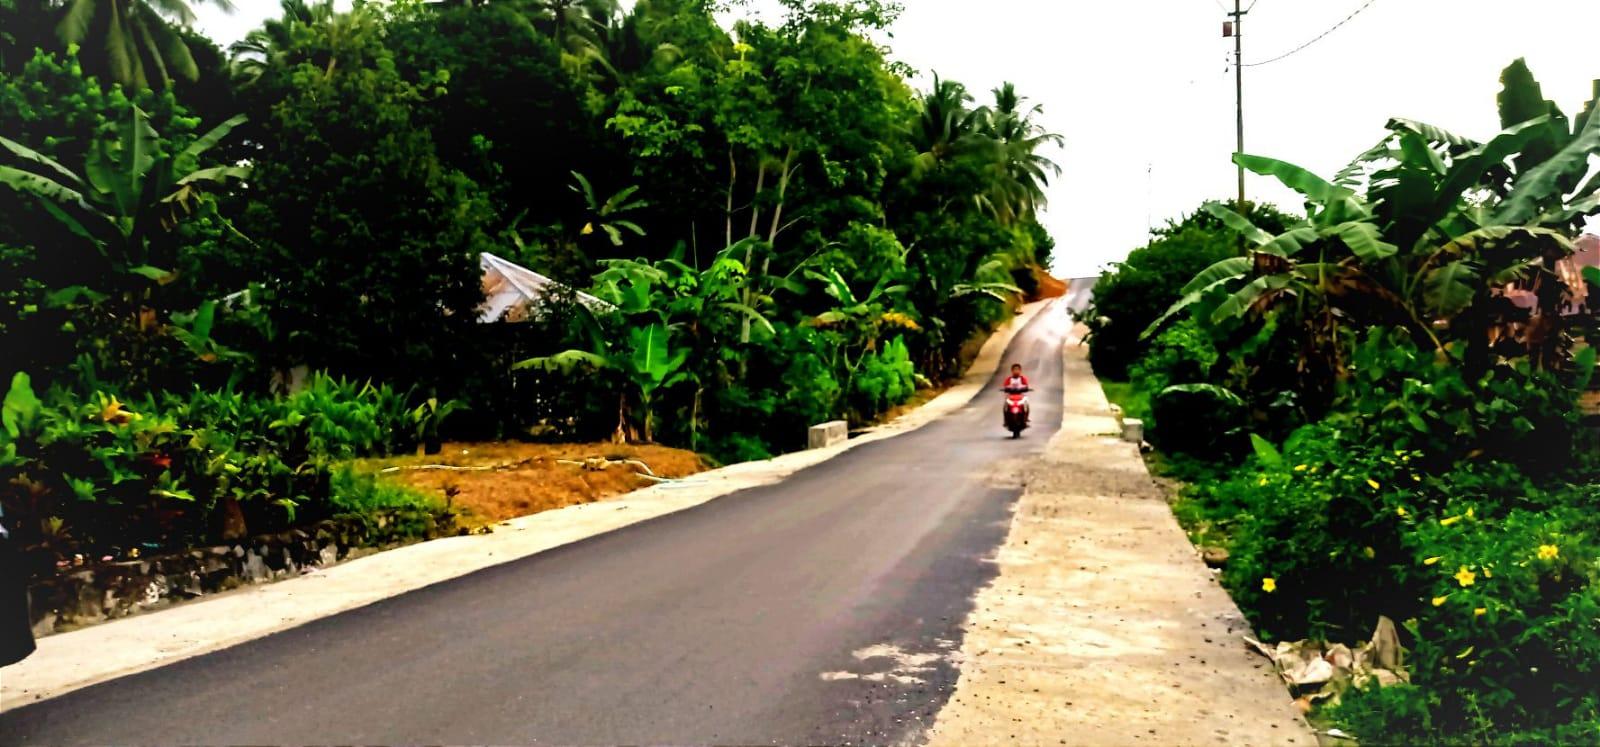 Aspal Jalan Makin Mulus, Waktu Tempuh Long – Lembah Mukti Makin Cepat 1